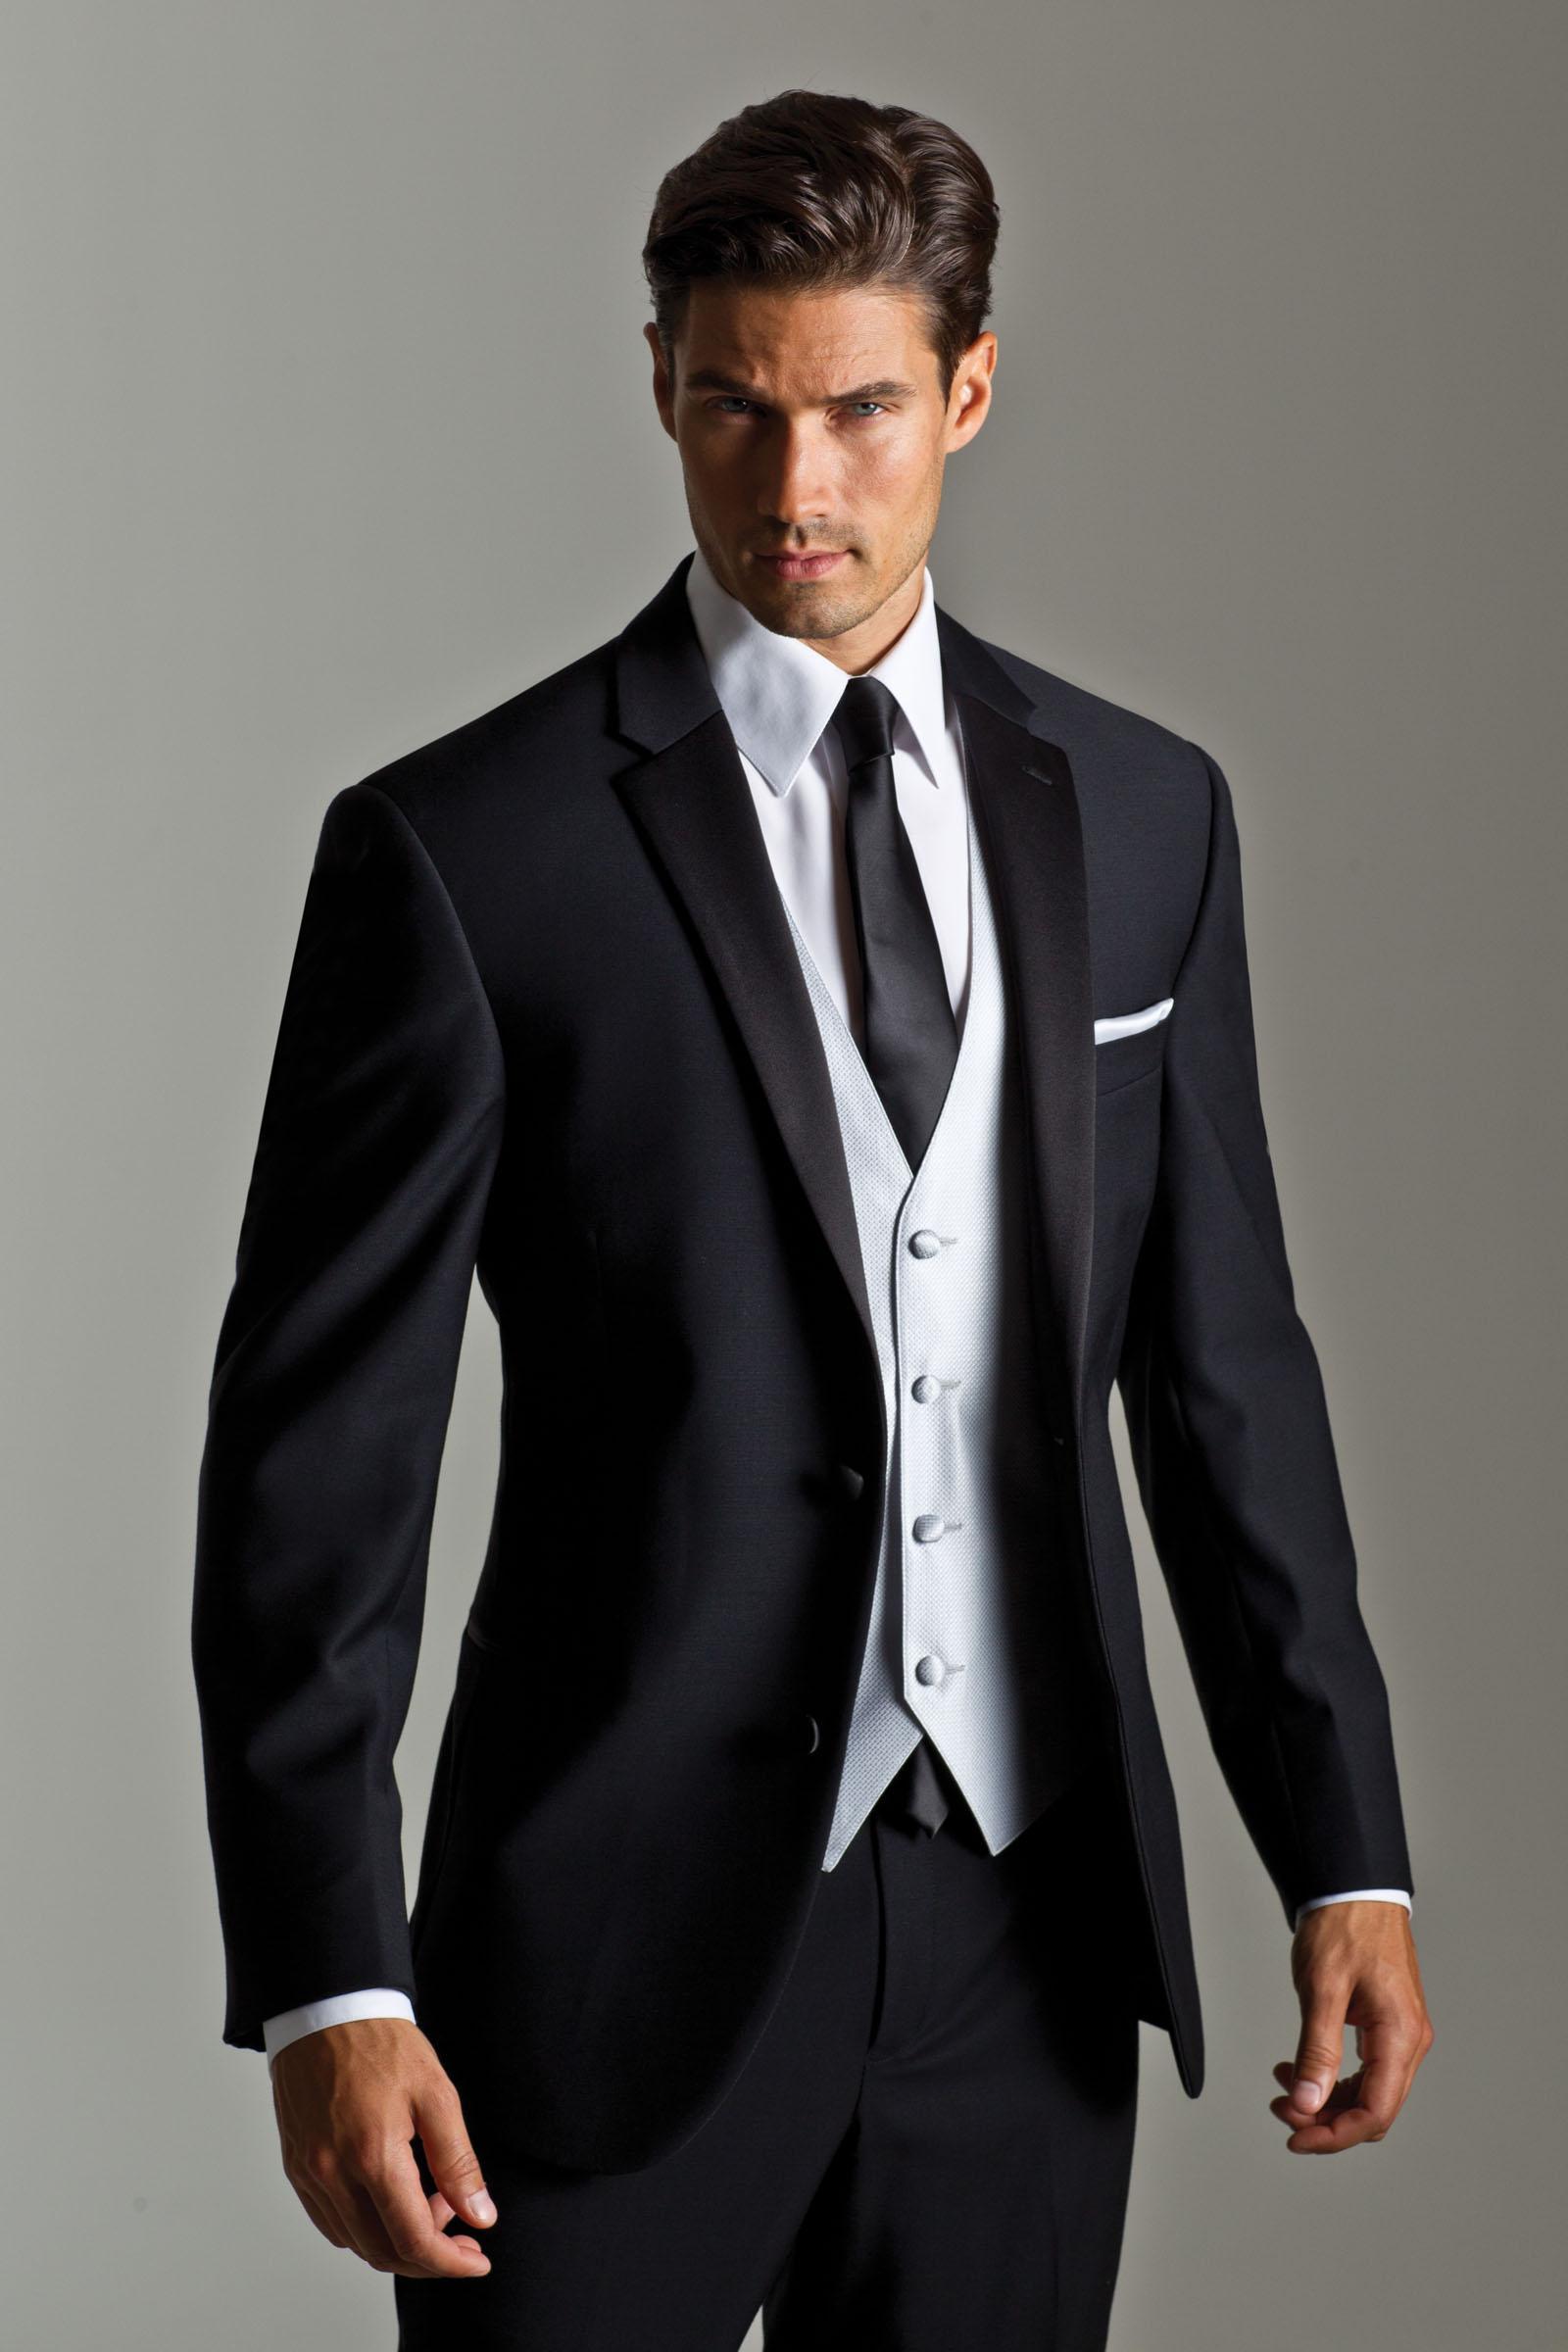 suits for men see larger image IHJSLOT